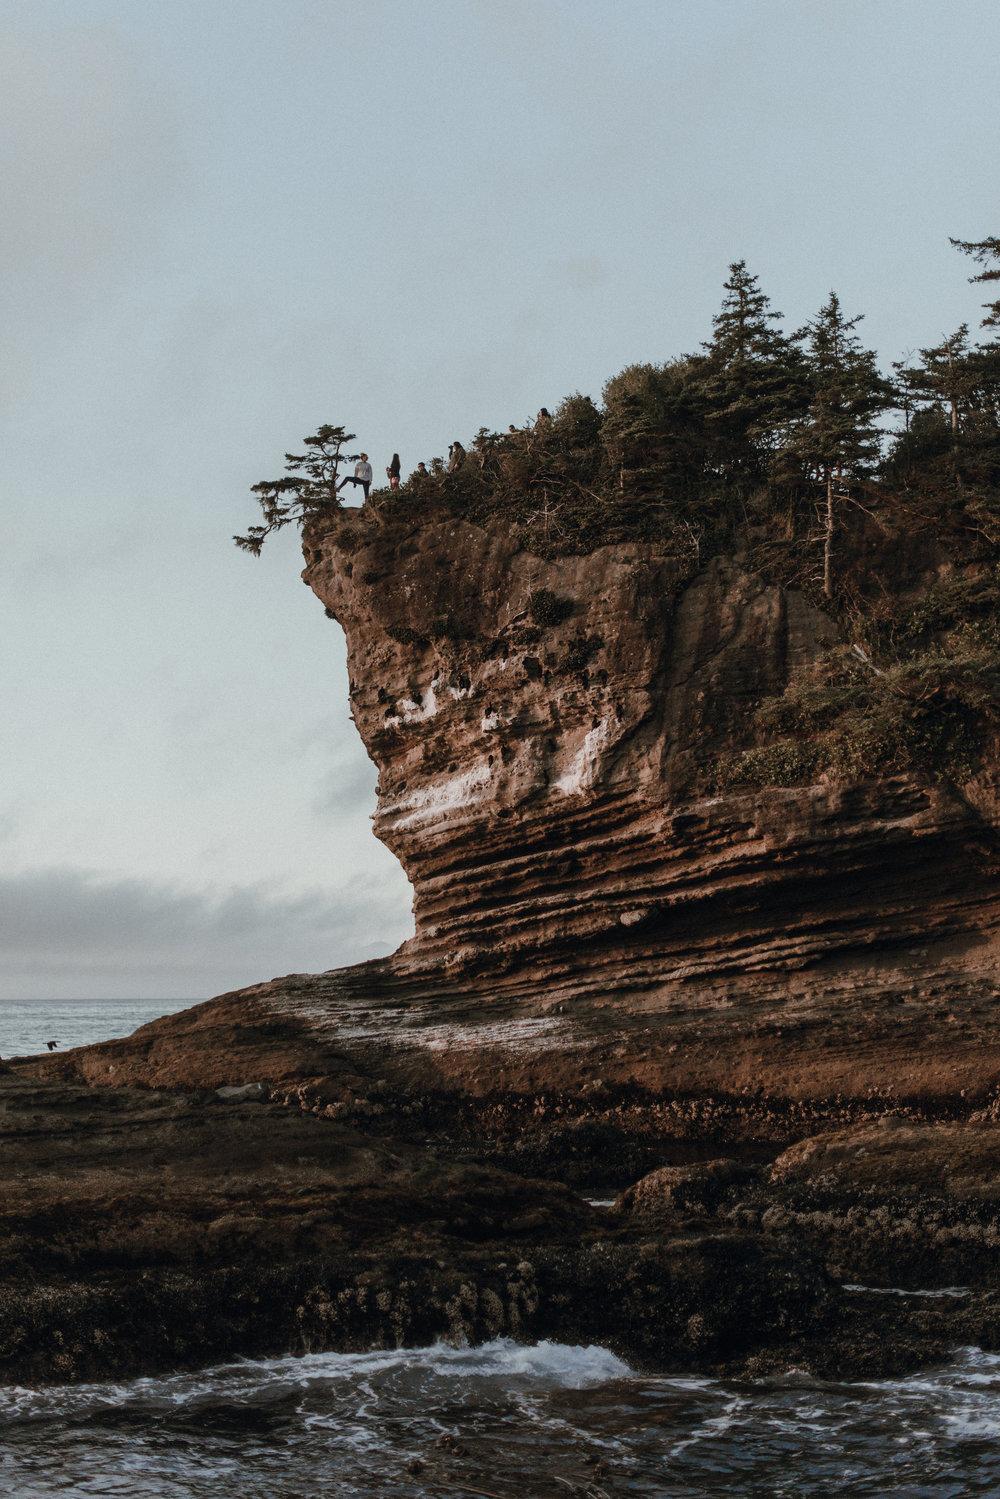 Washington state rocky coast at Cape flattery.